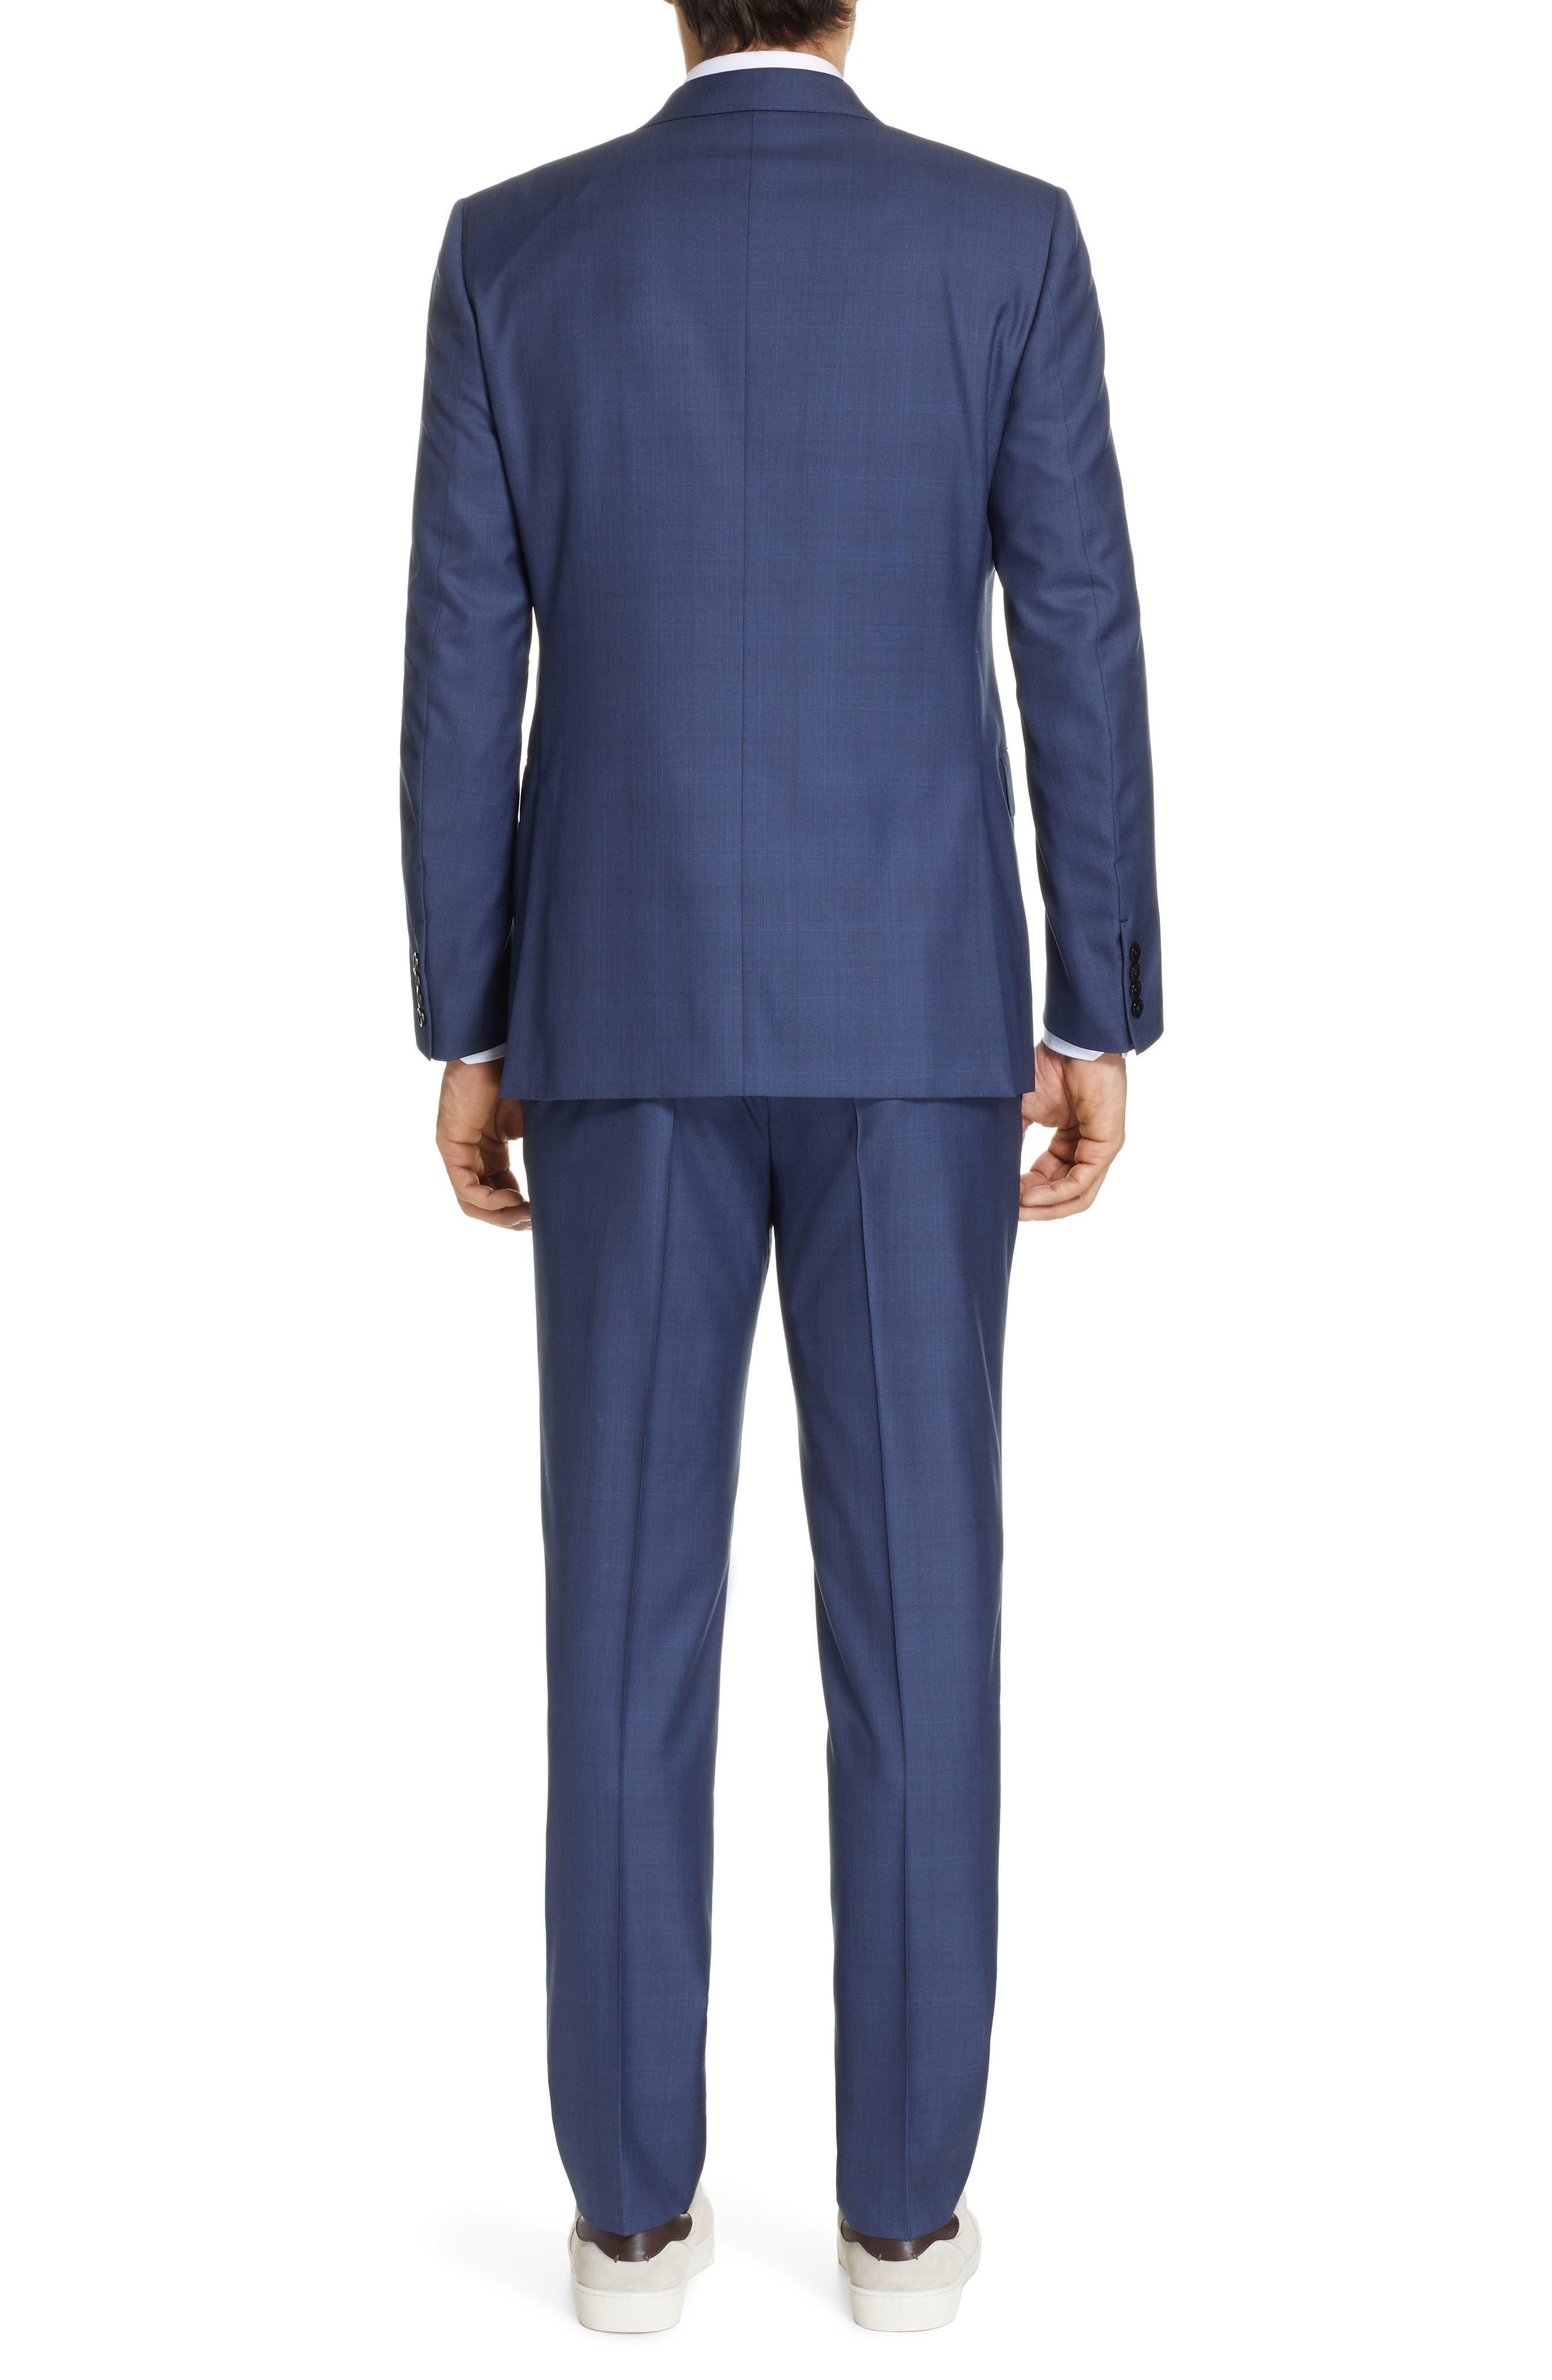 ERMENEGILDO ZEGNA, Trofeo Classic Fit Plaid Wool & Silk Suit, Alternate thumbnail 2, color, BLUE